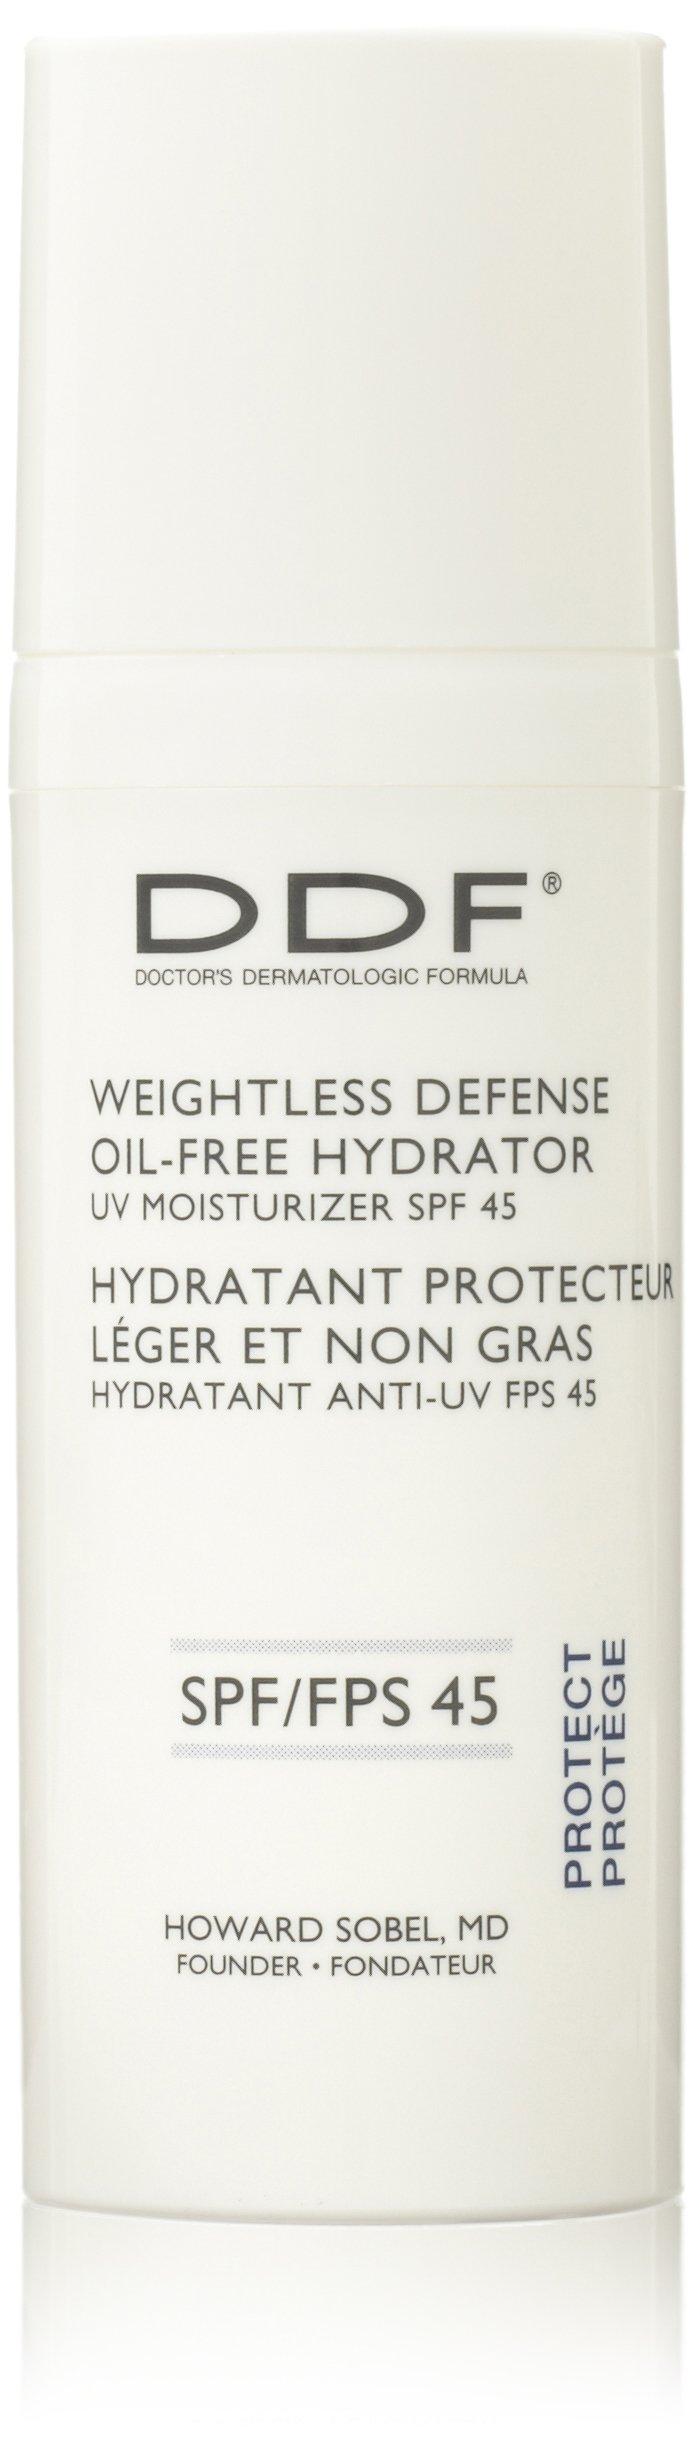 DDF Weightless Defense Oil-Free Hydrator UV Moisturizer SPF 45 , 1.7 fl. oz.